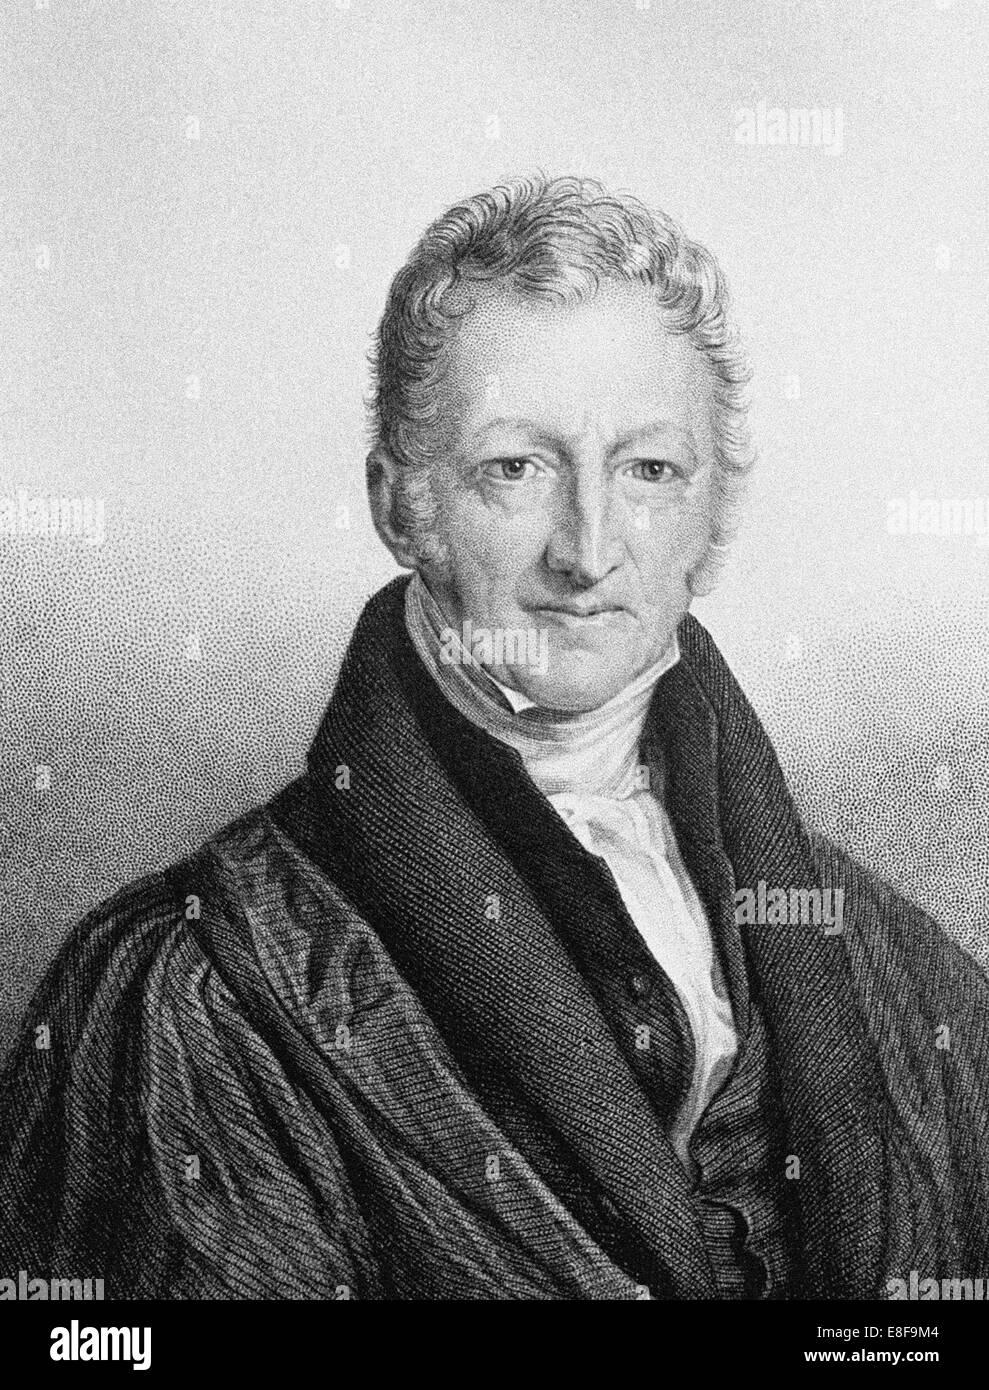 Portrait of Thomas Robert Malthus (1766-1834). Artist: Linnell, John (1792-1882) - Stock Image